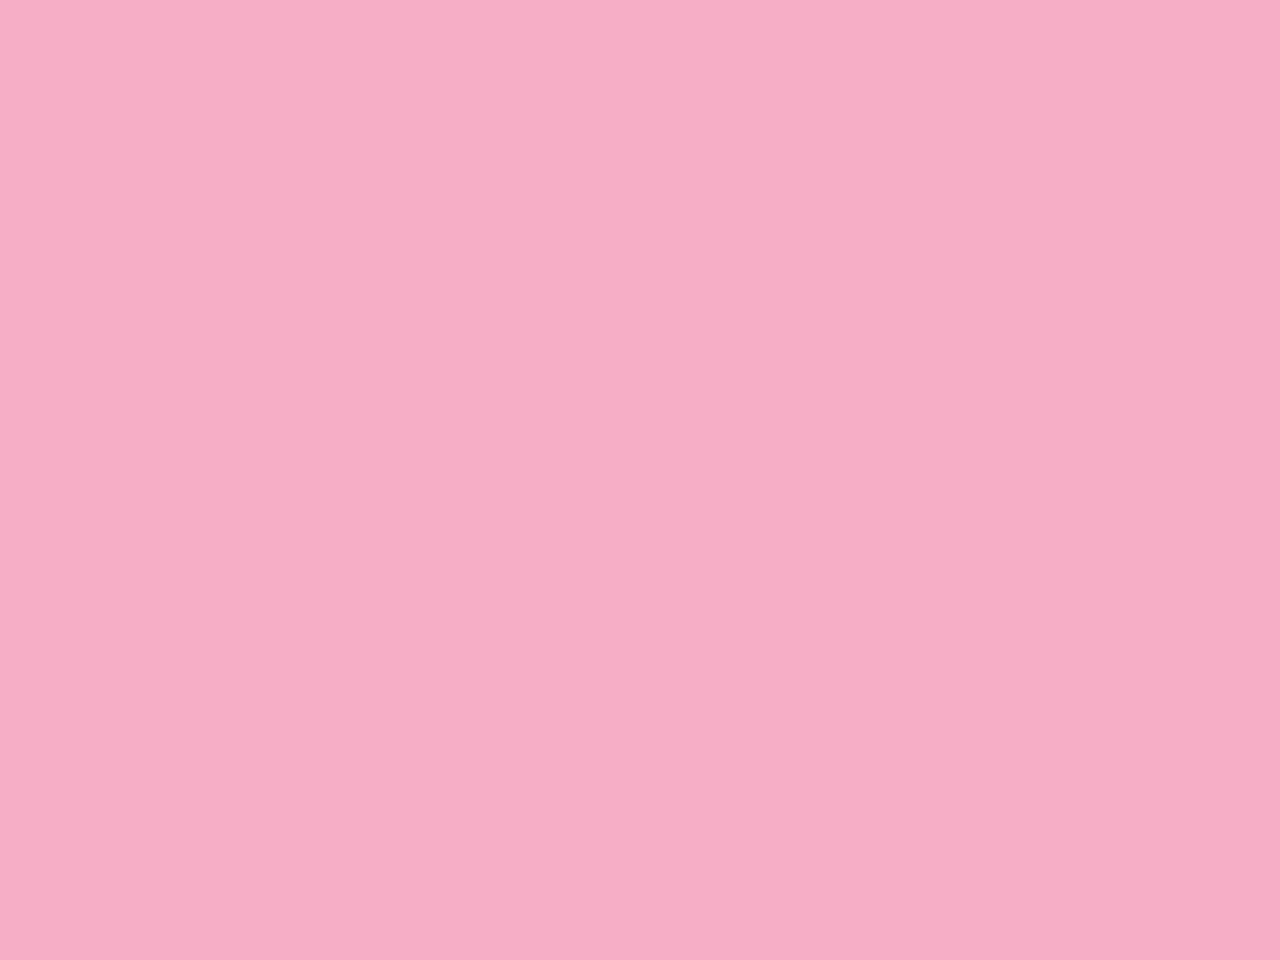 1280x960 Nadeshiko Pink Solid Color Background